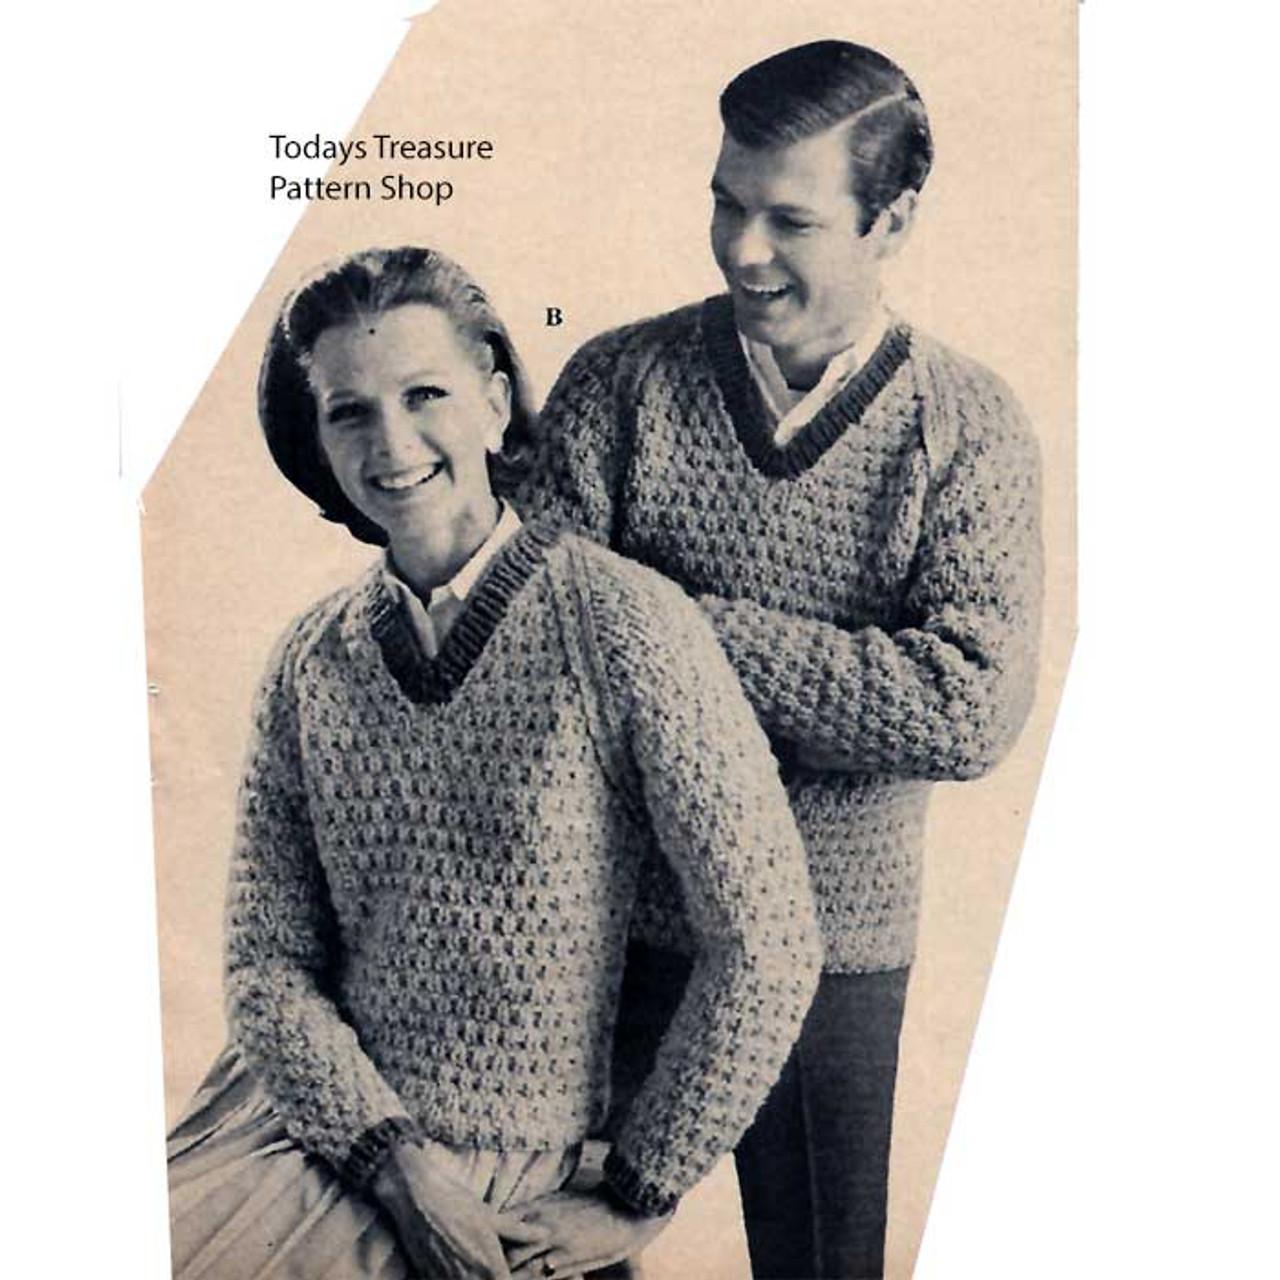 Vintage Knitting Pattern, Matching V-Neck Sweaters